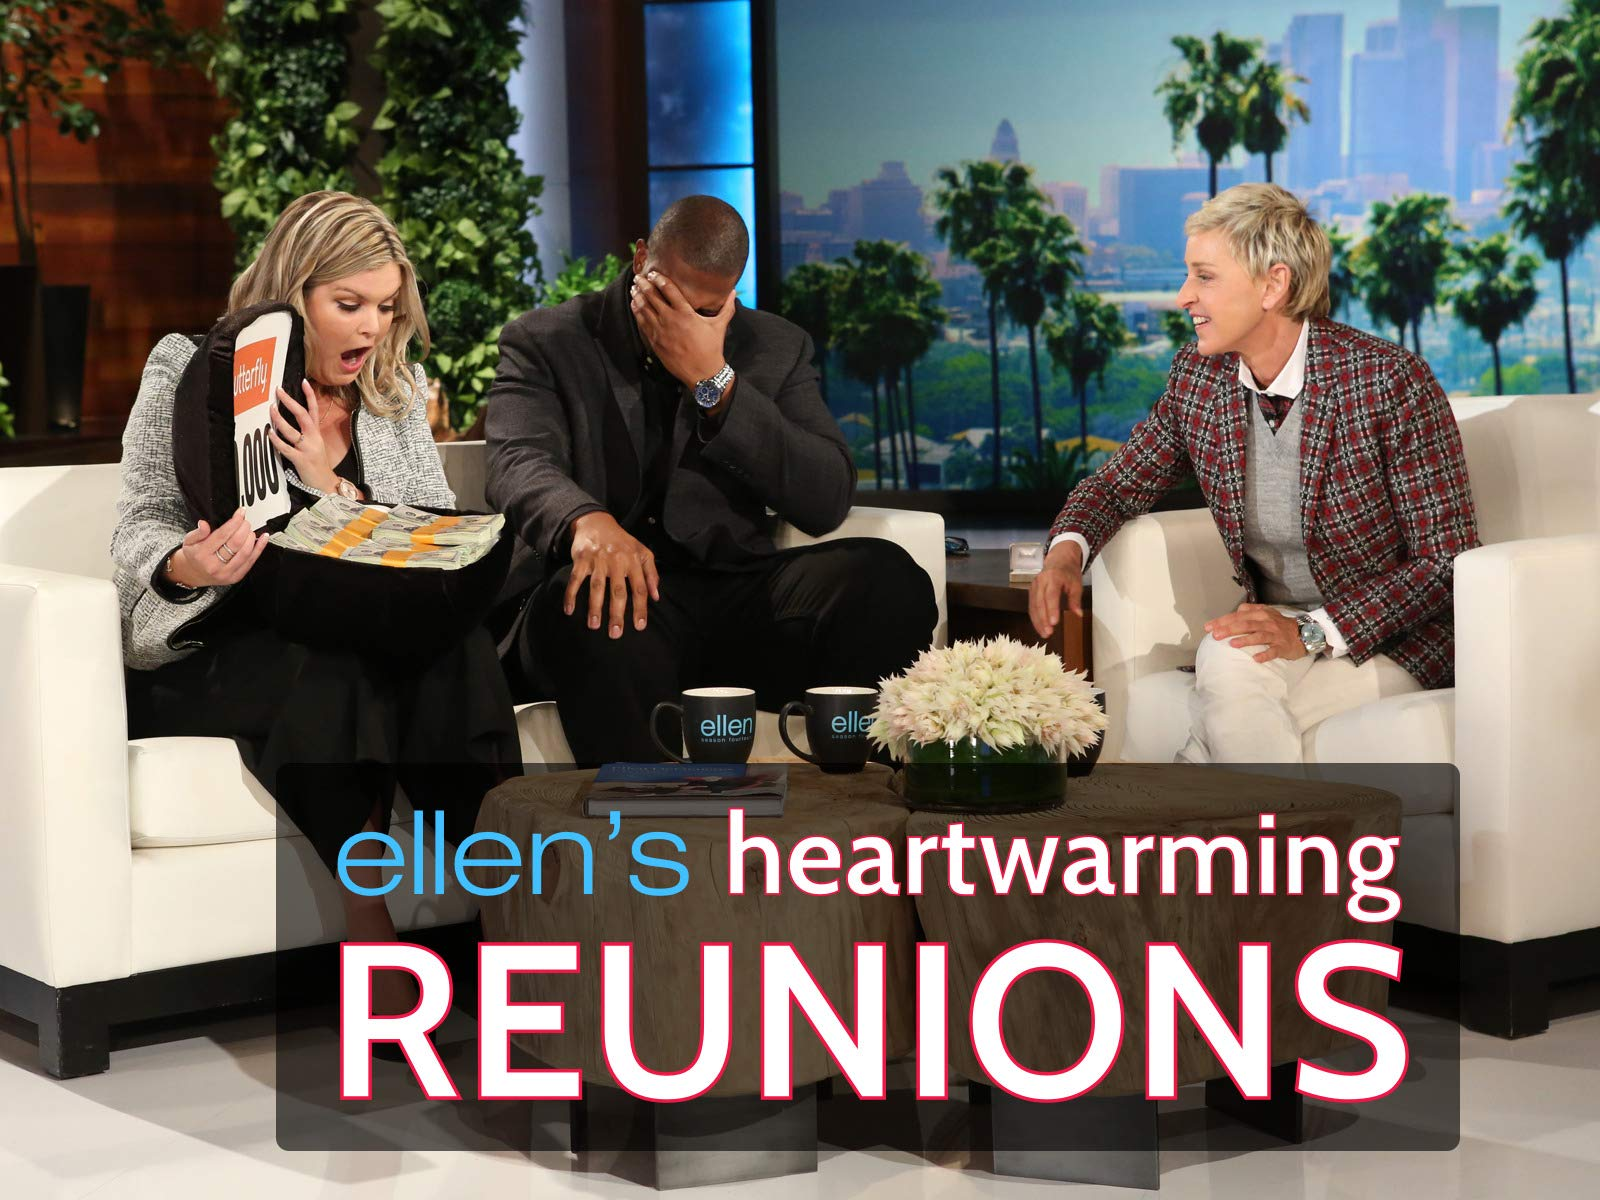 Ellen's Heartwarming Reunions